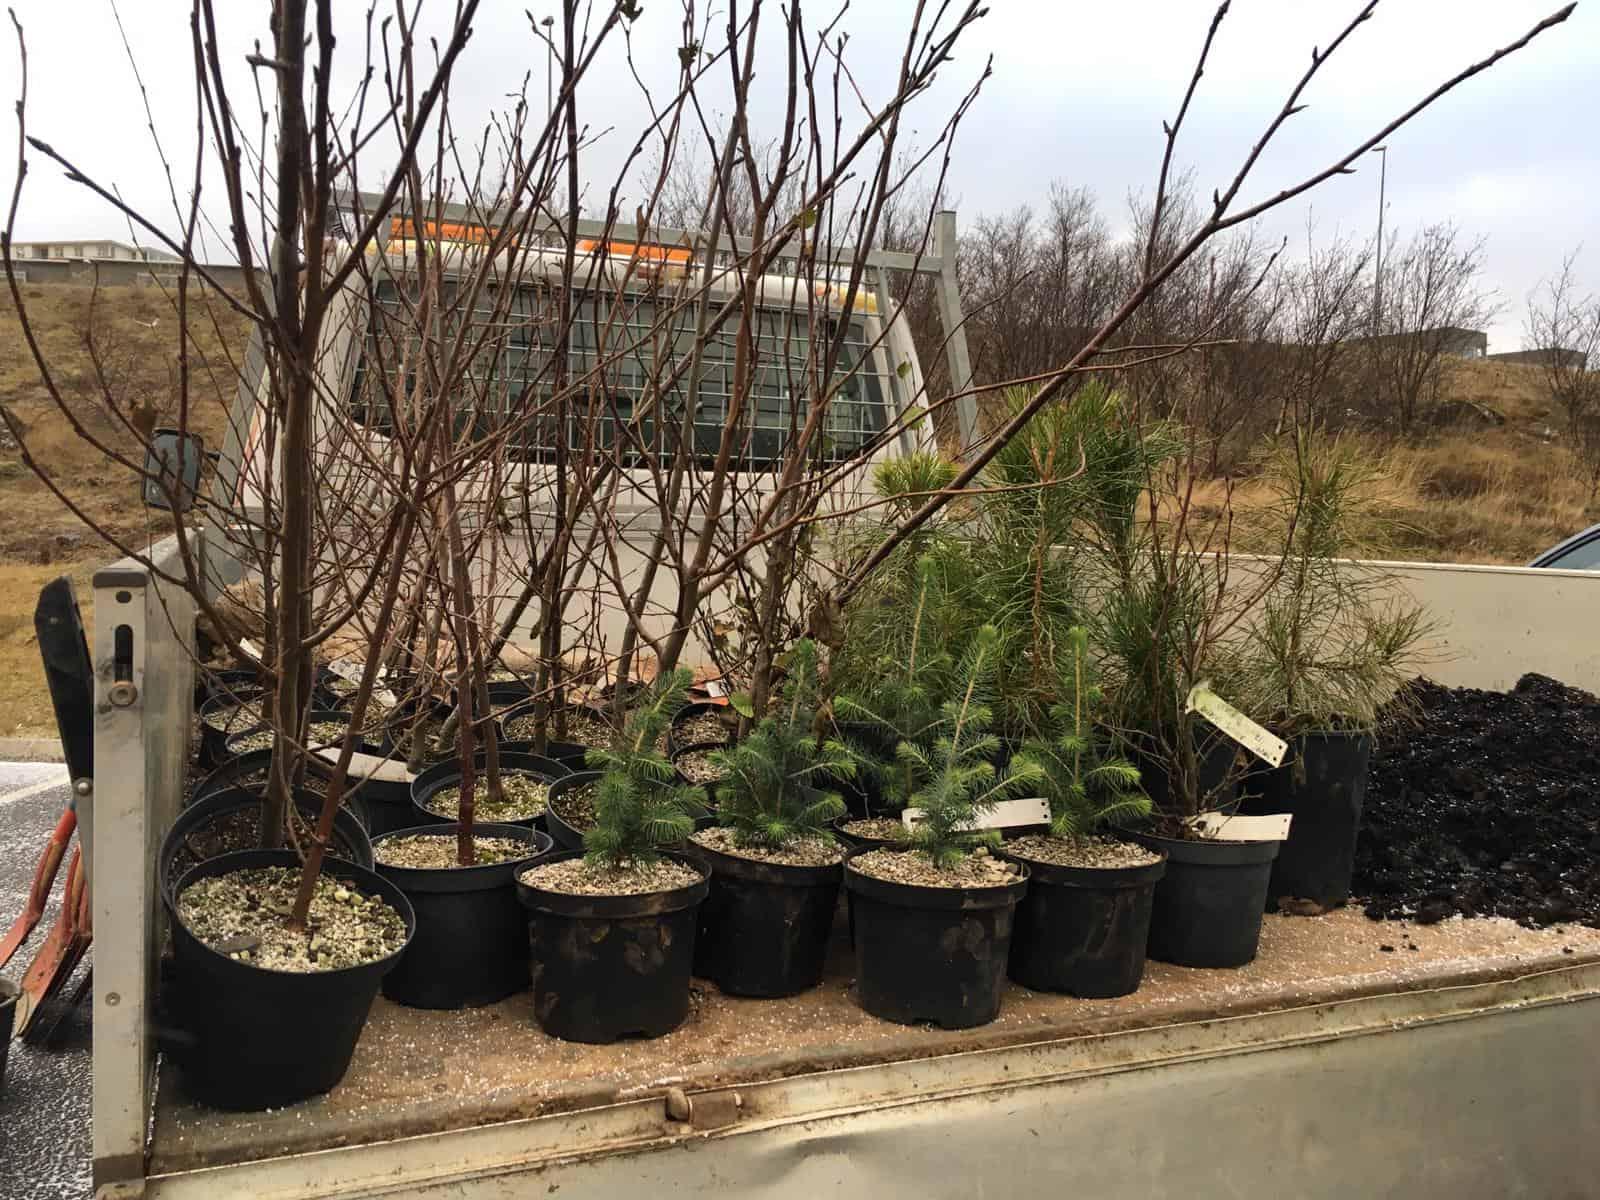 Planting trees in Reykjavíc for Climathon 2019